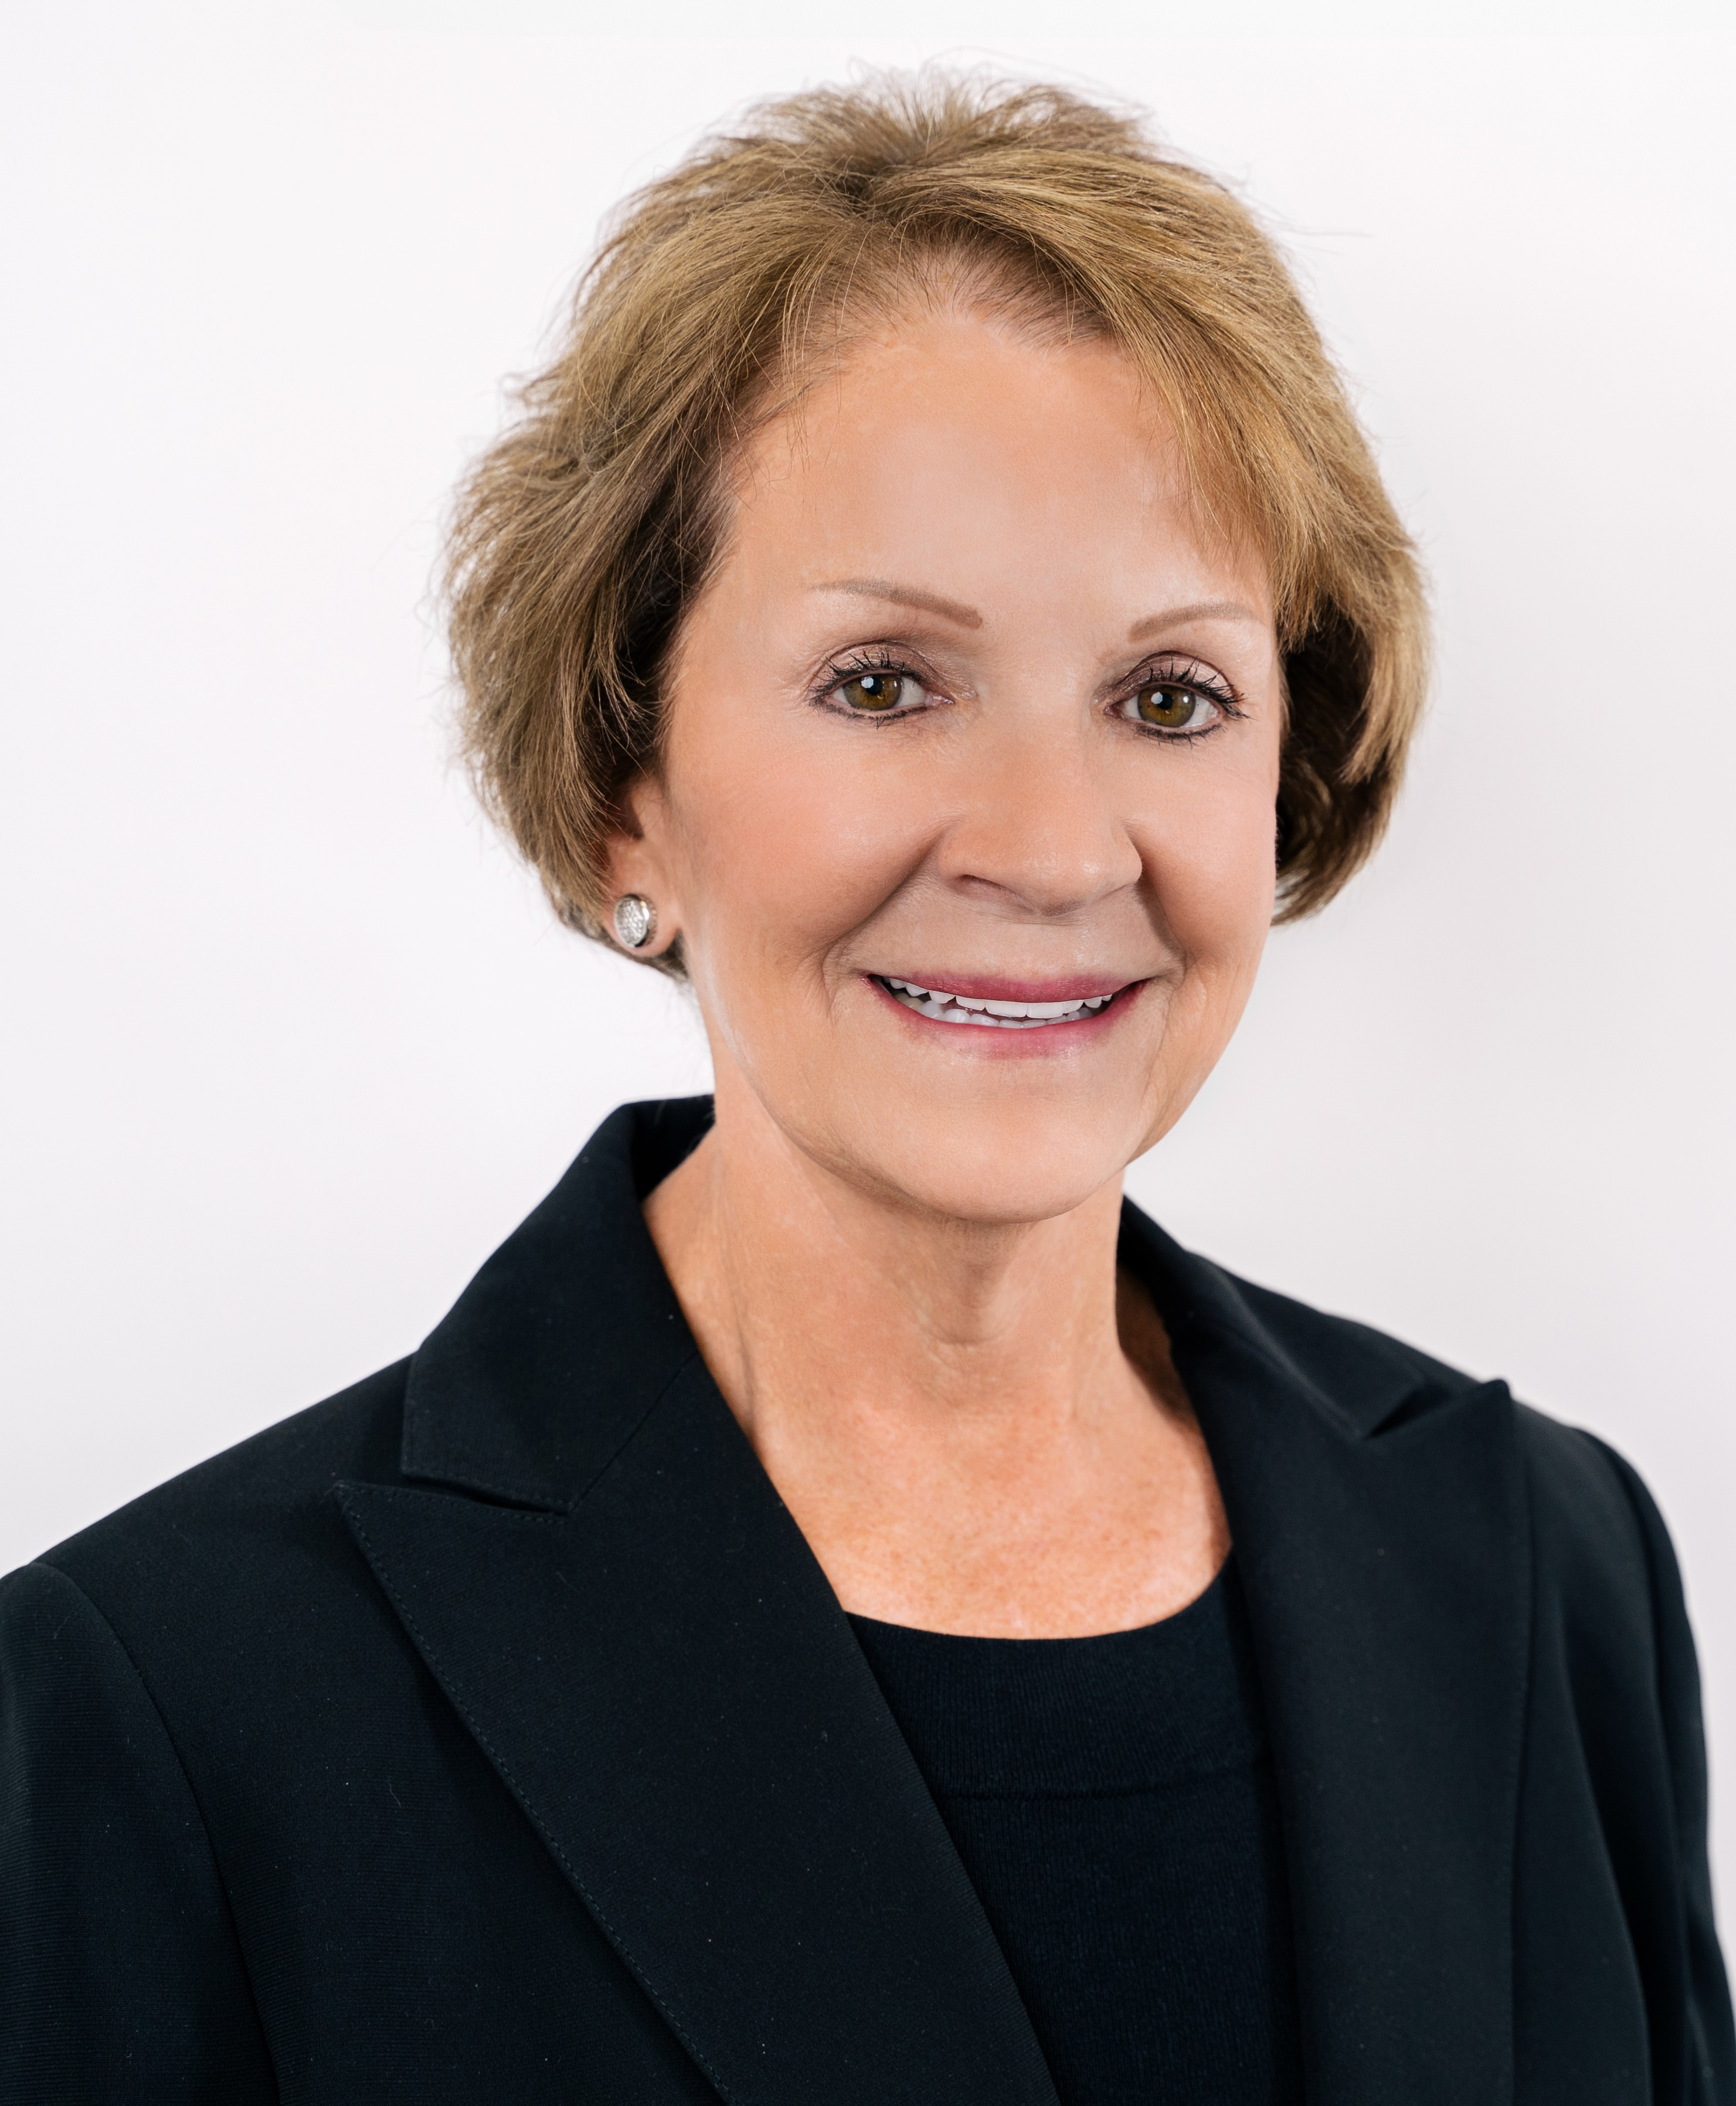 Maureen Brand